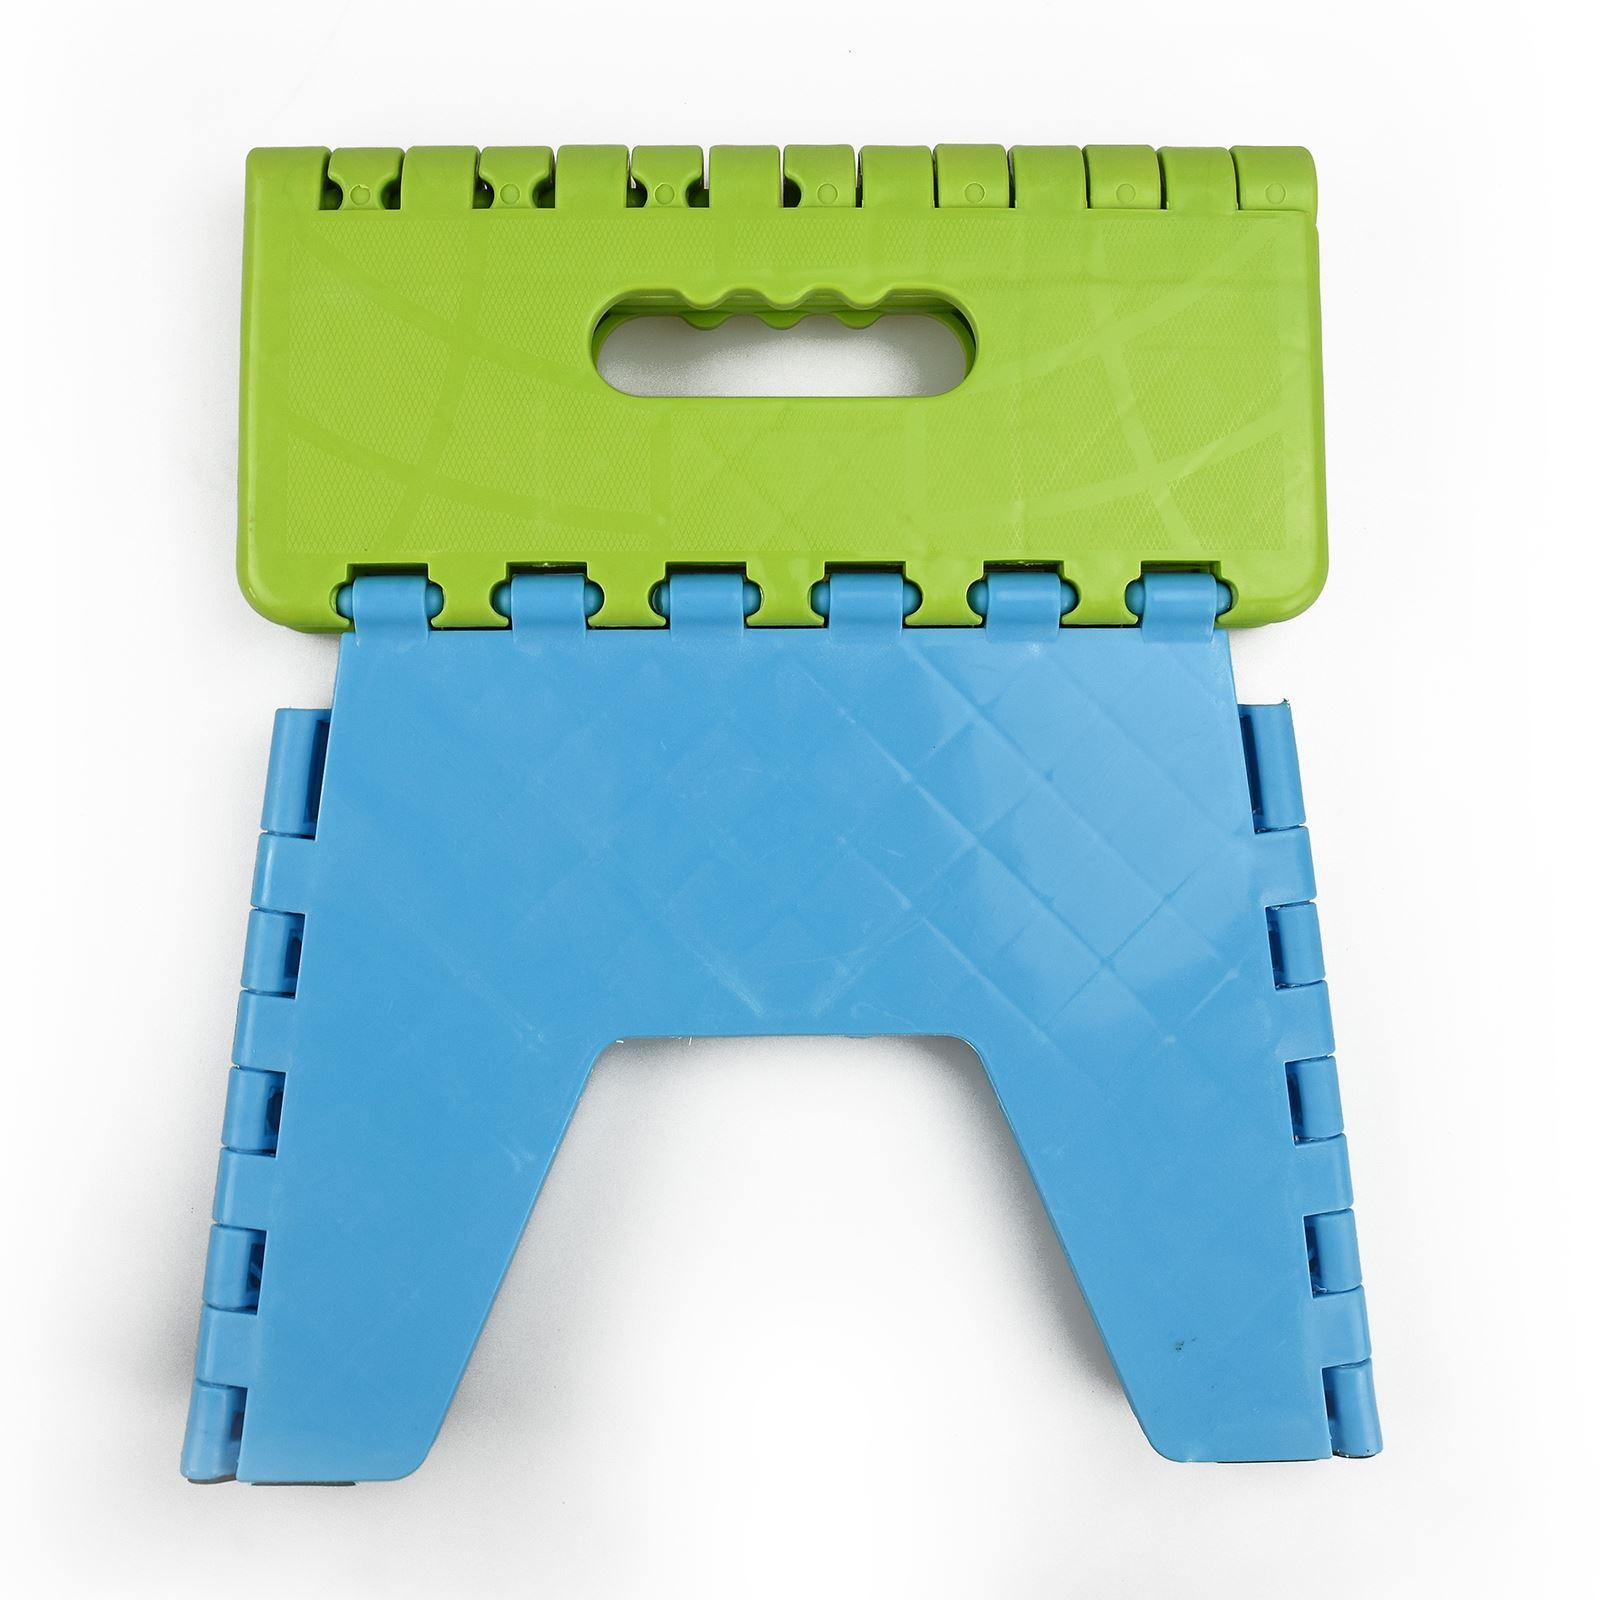 New Plastic Multi Purpose Folding Step Stool Home Kitchen